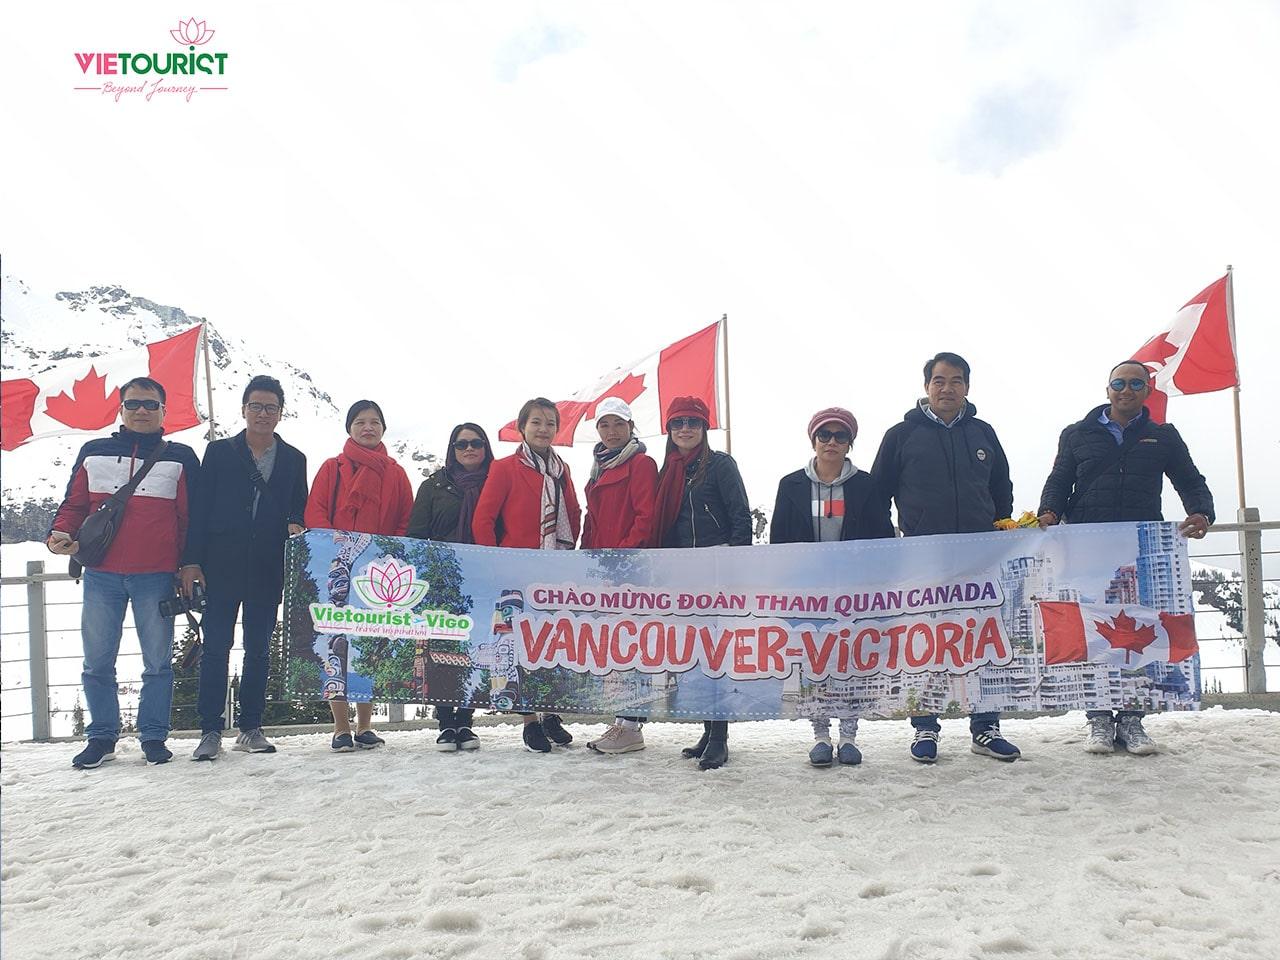 Du khách tham gia tour bờ tây canada tại Vietourist